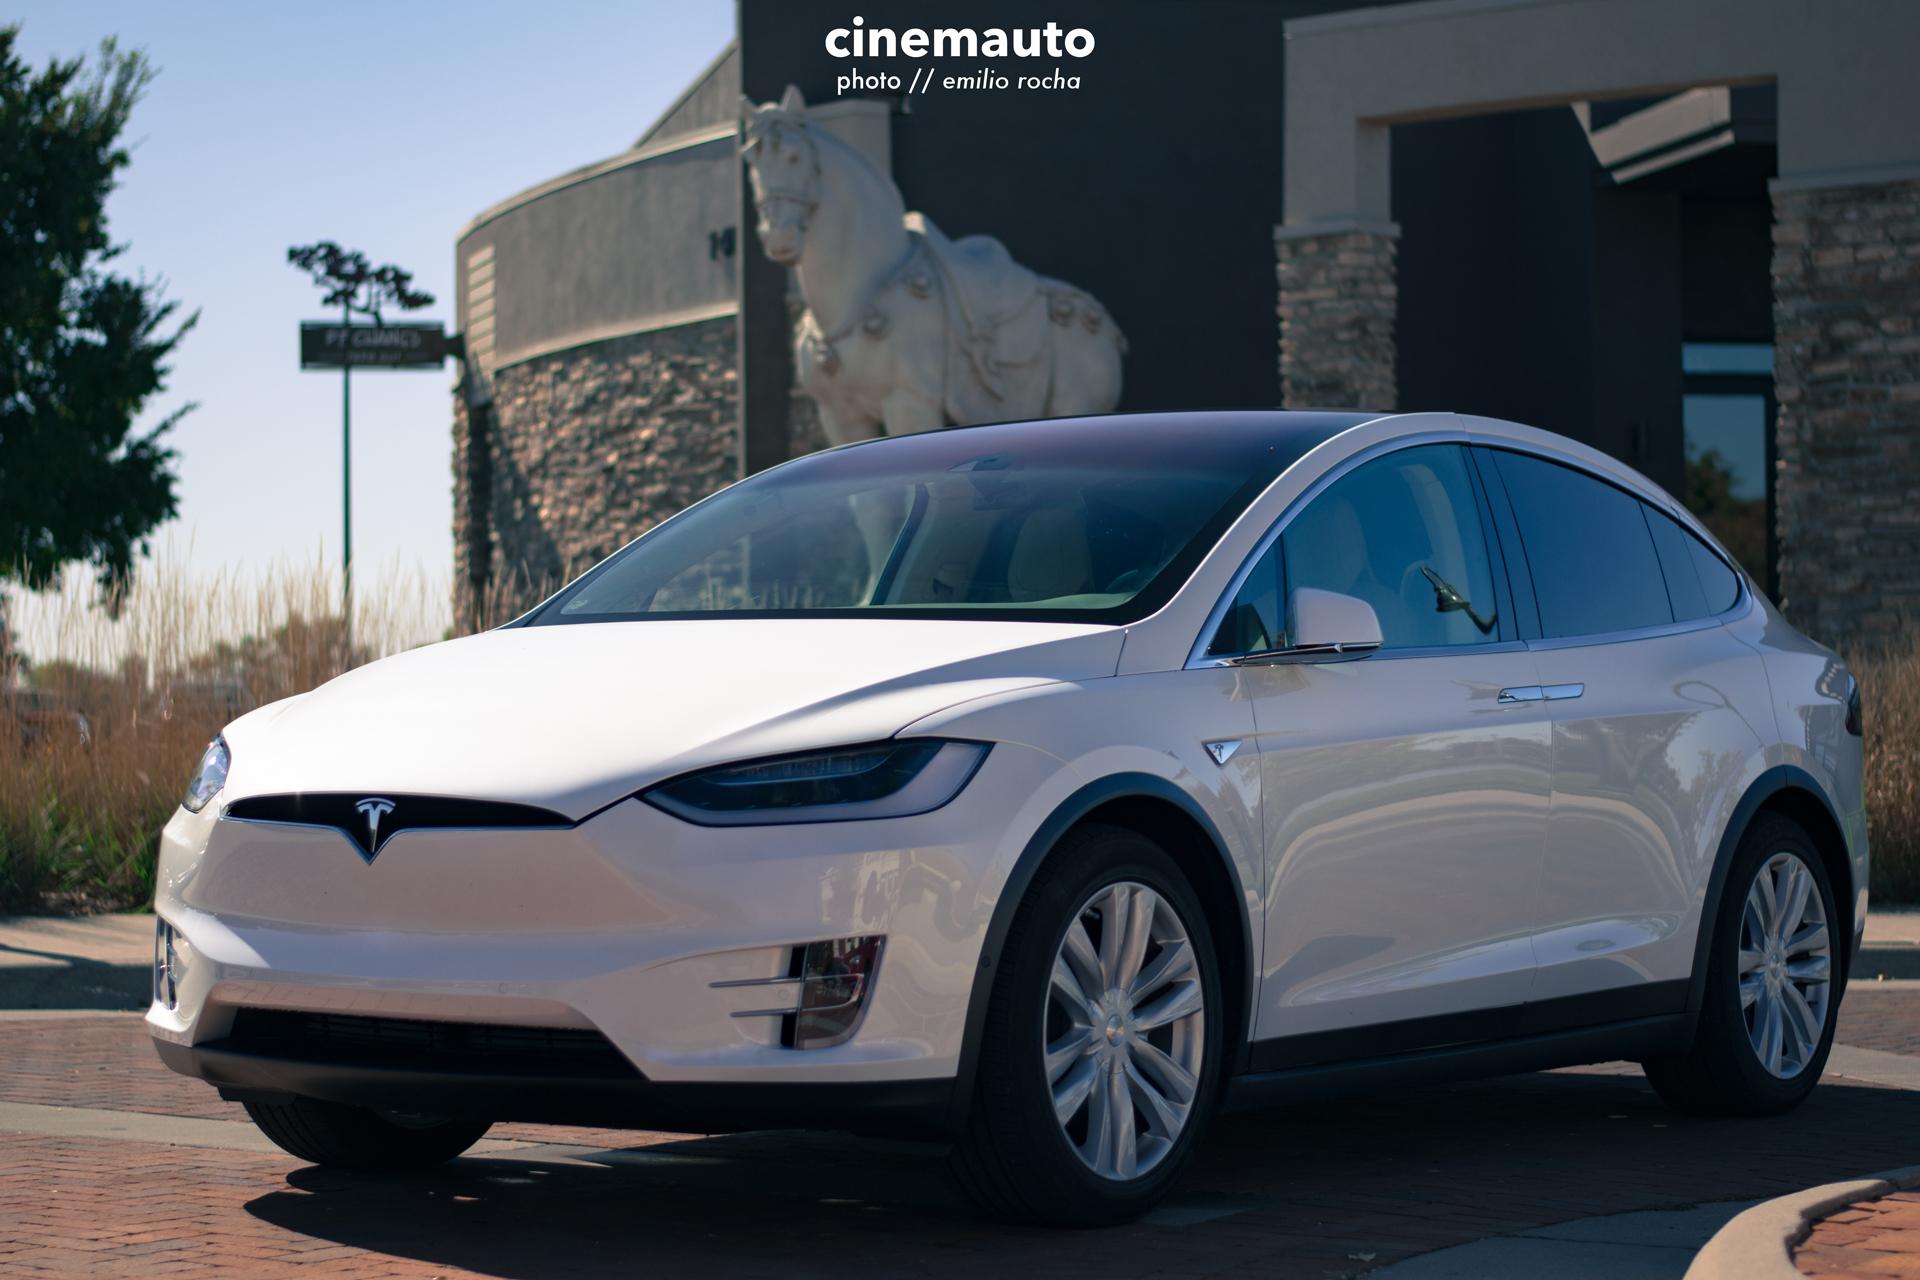 TeslaCinemauto-6.jpg